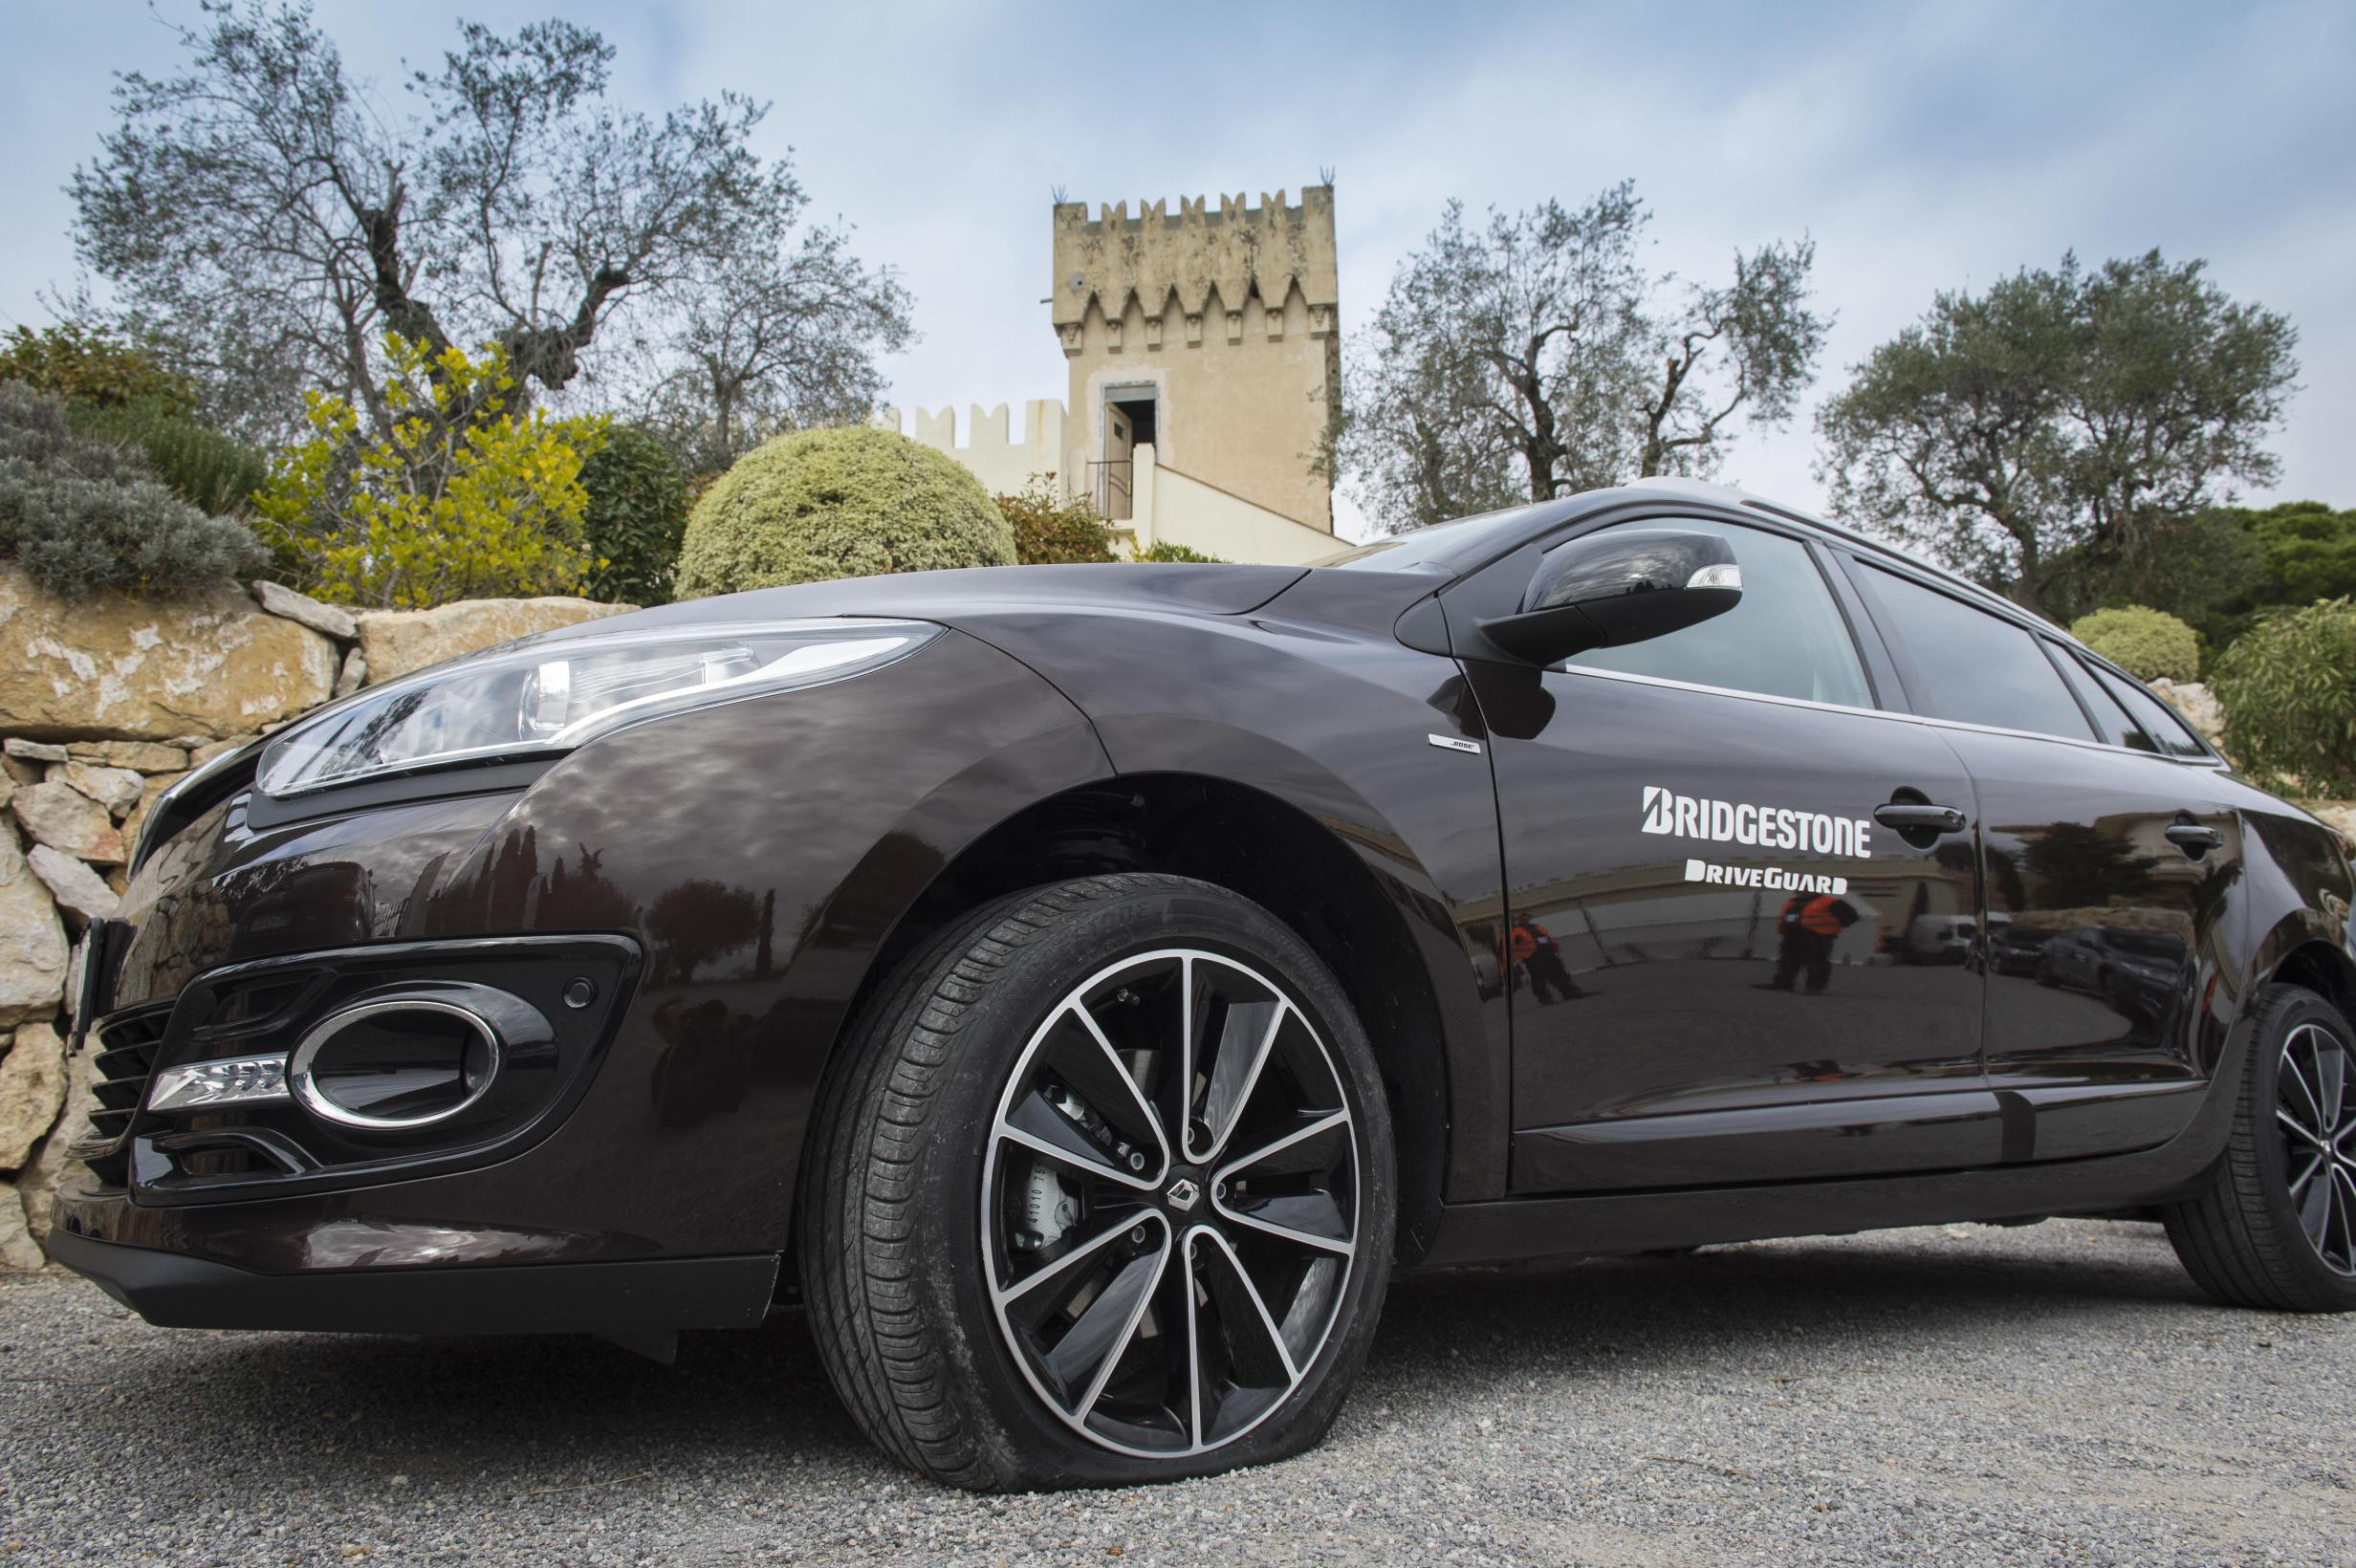 Bridgestone DriveGuard 1